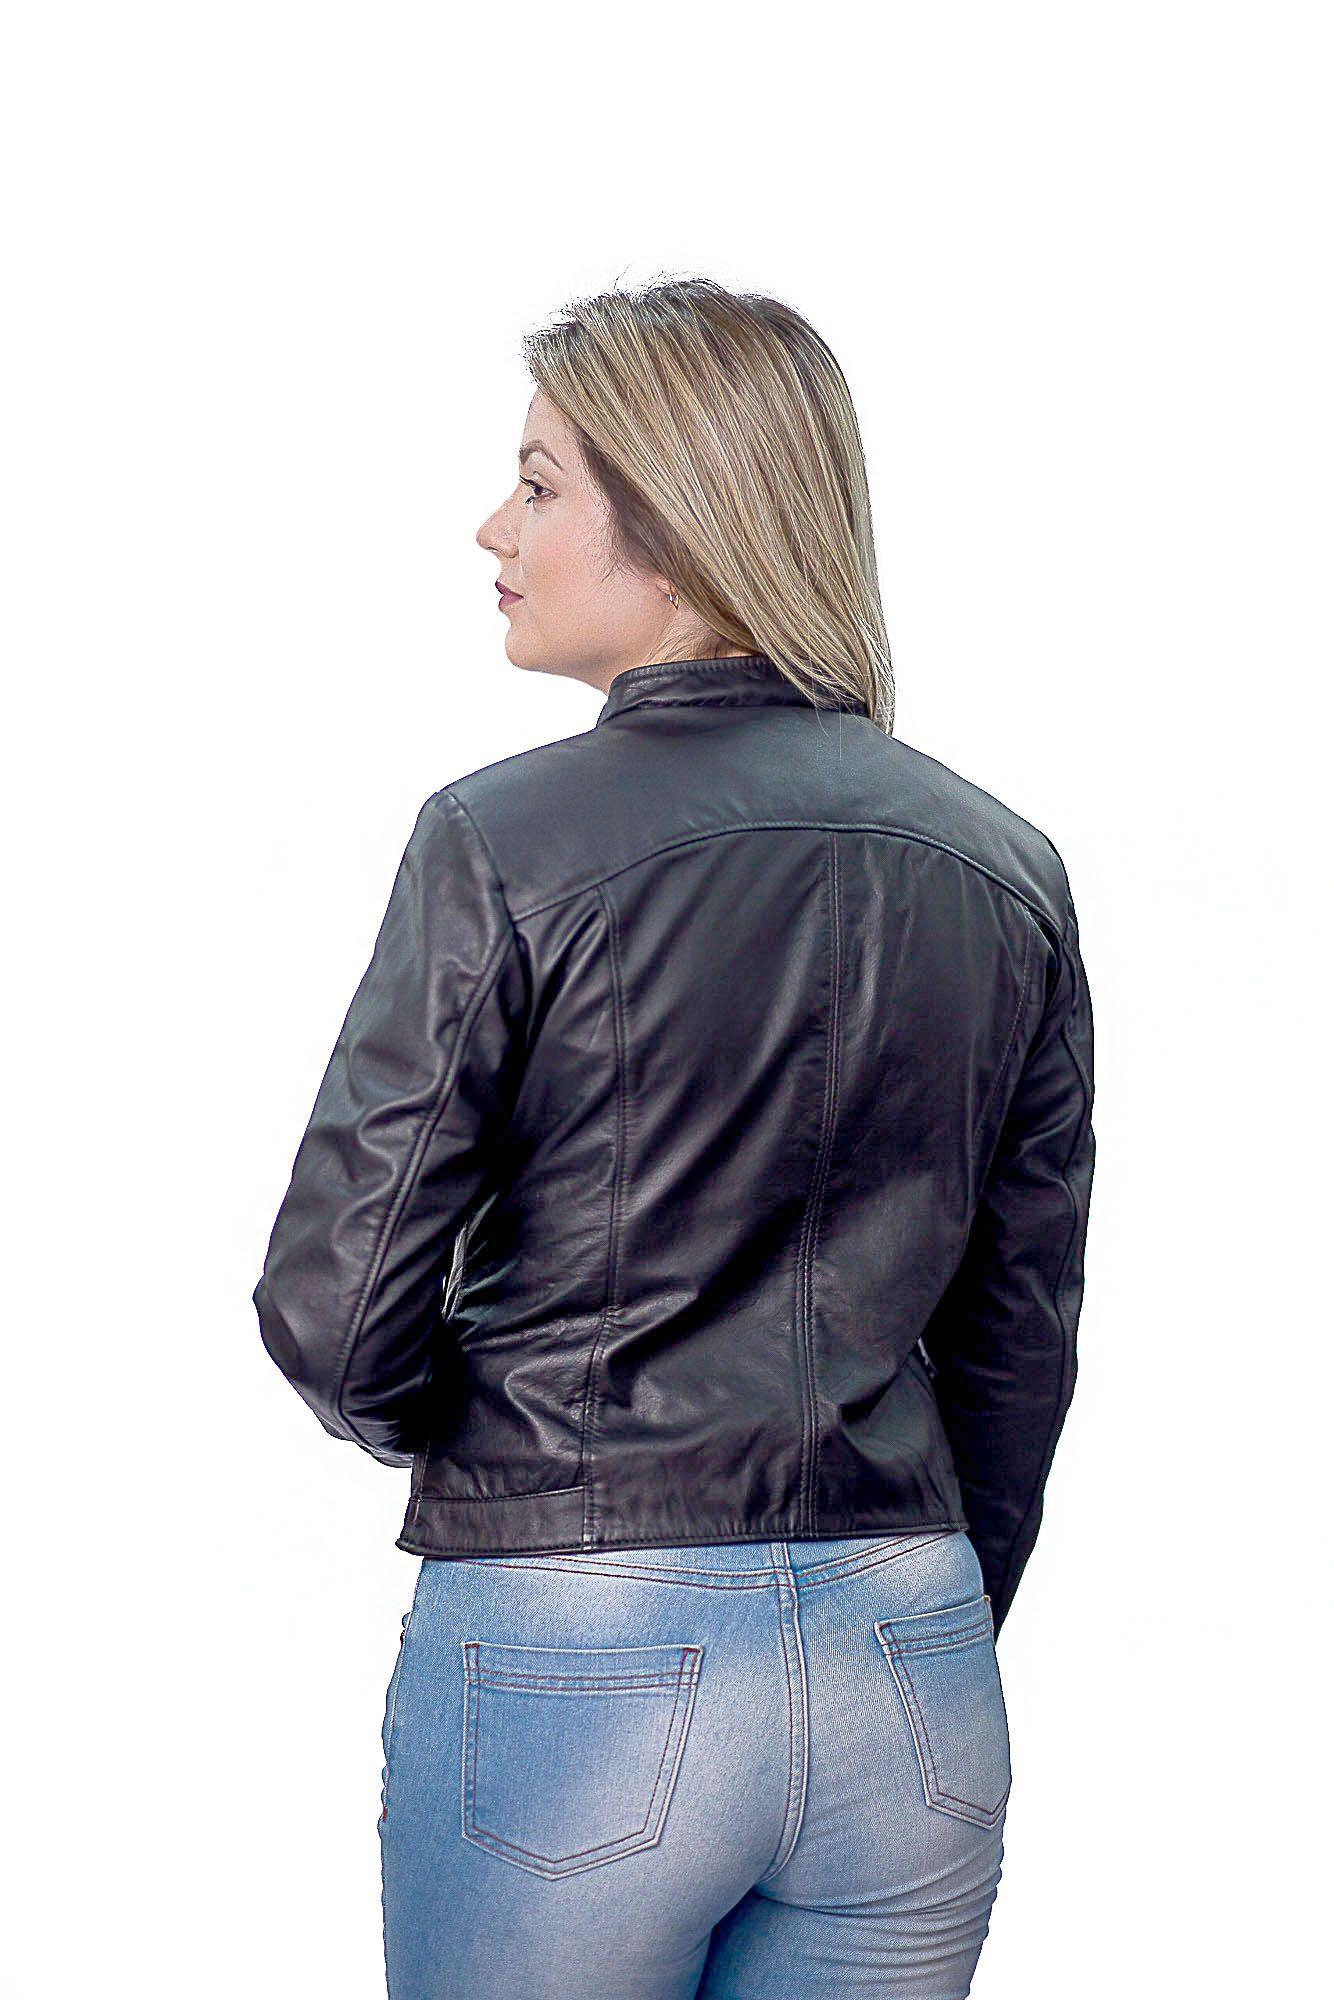 Jaqueta Feminina 211 Prata Couro Vest Preto